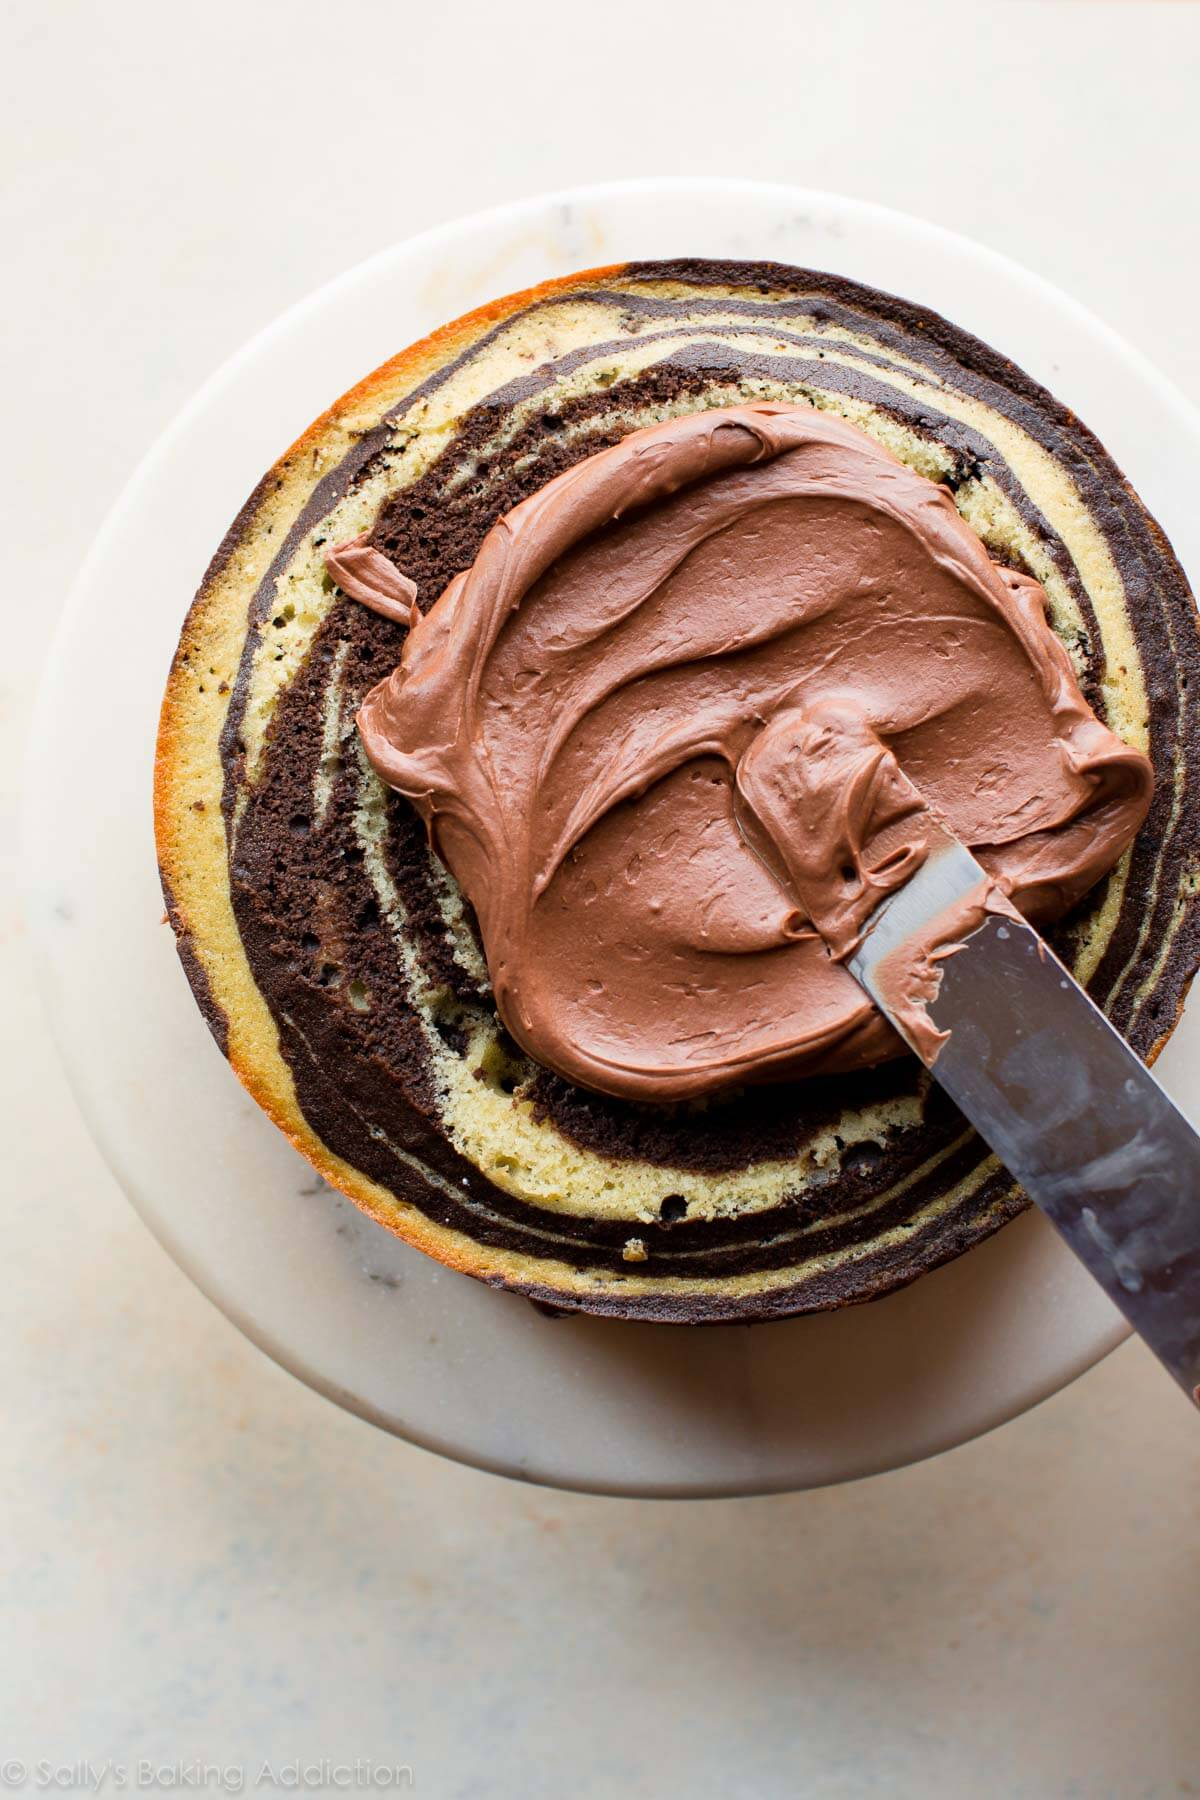 Creamy chocolate cream cheese frosting on sallysbakingaddiction.com